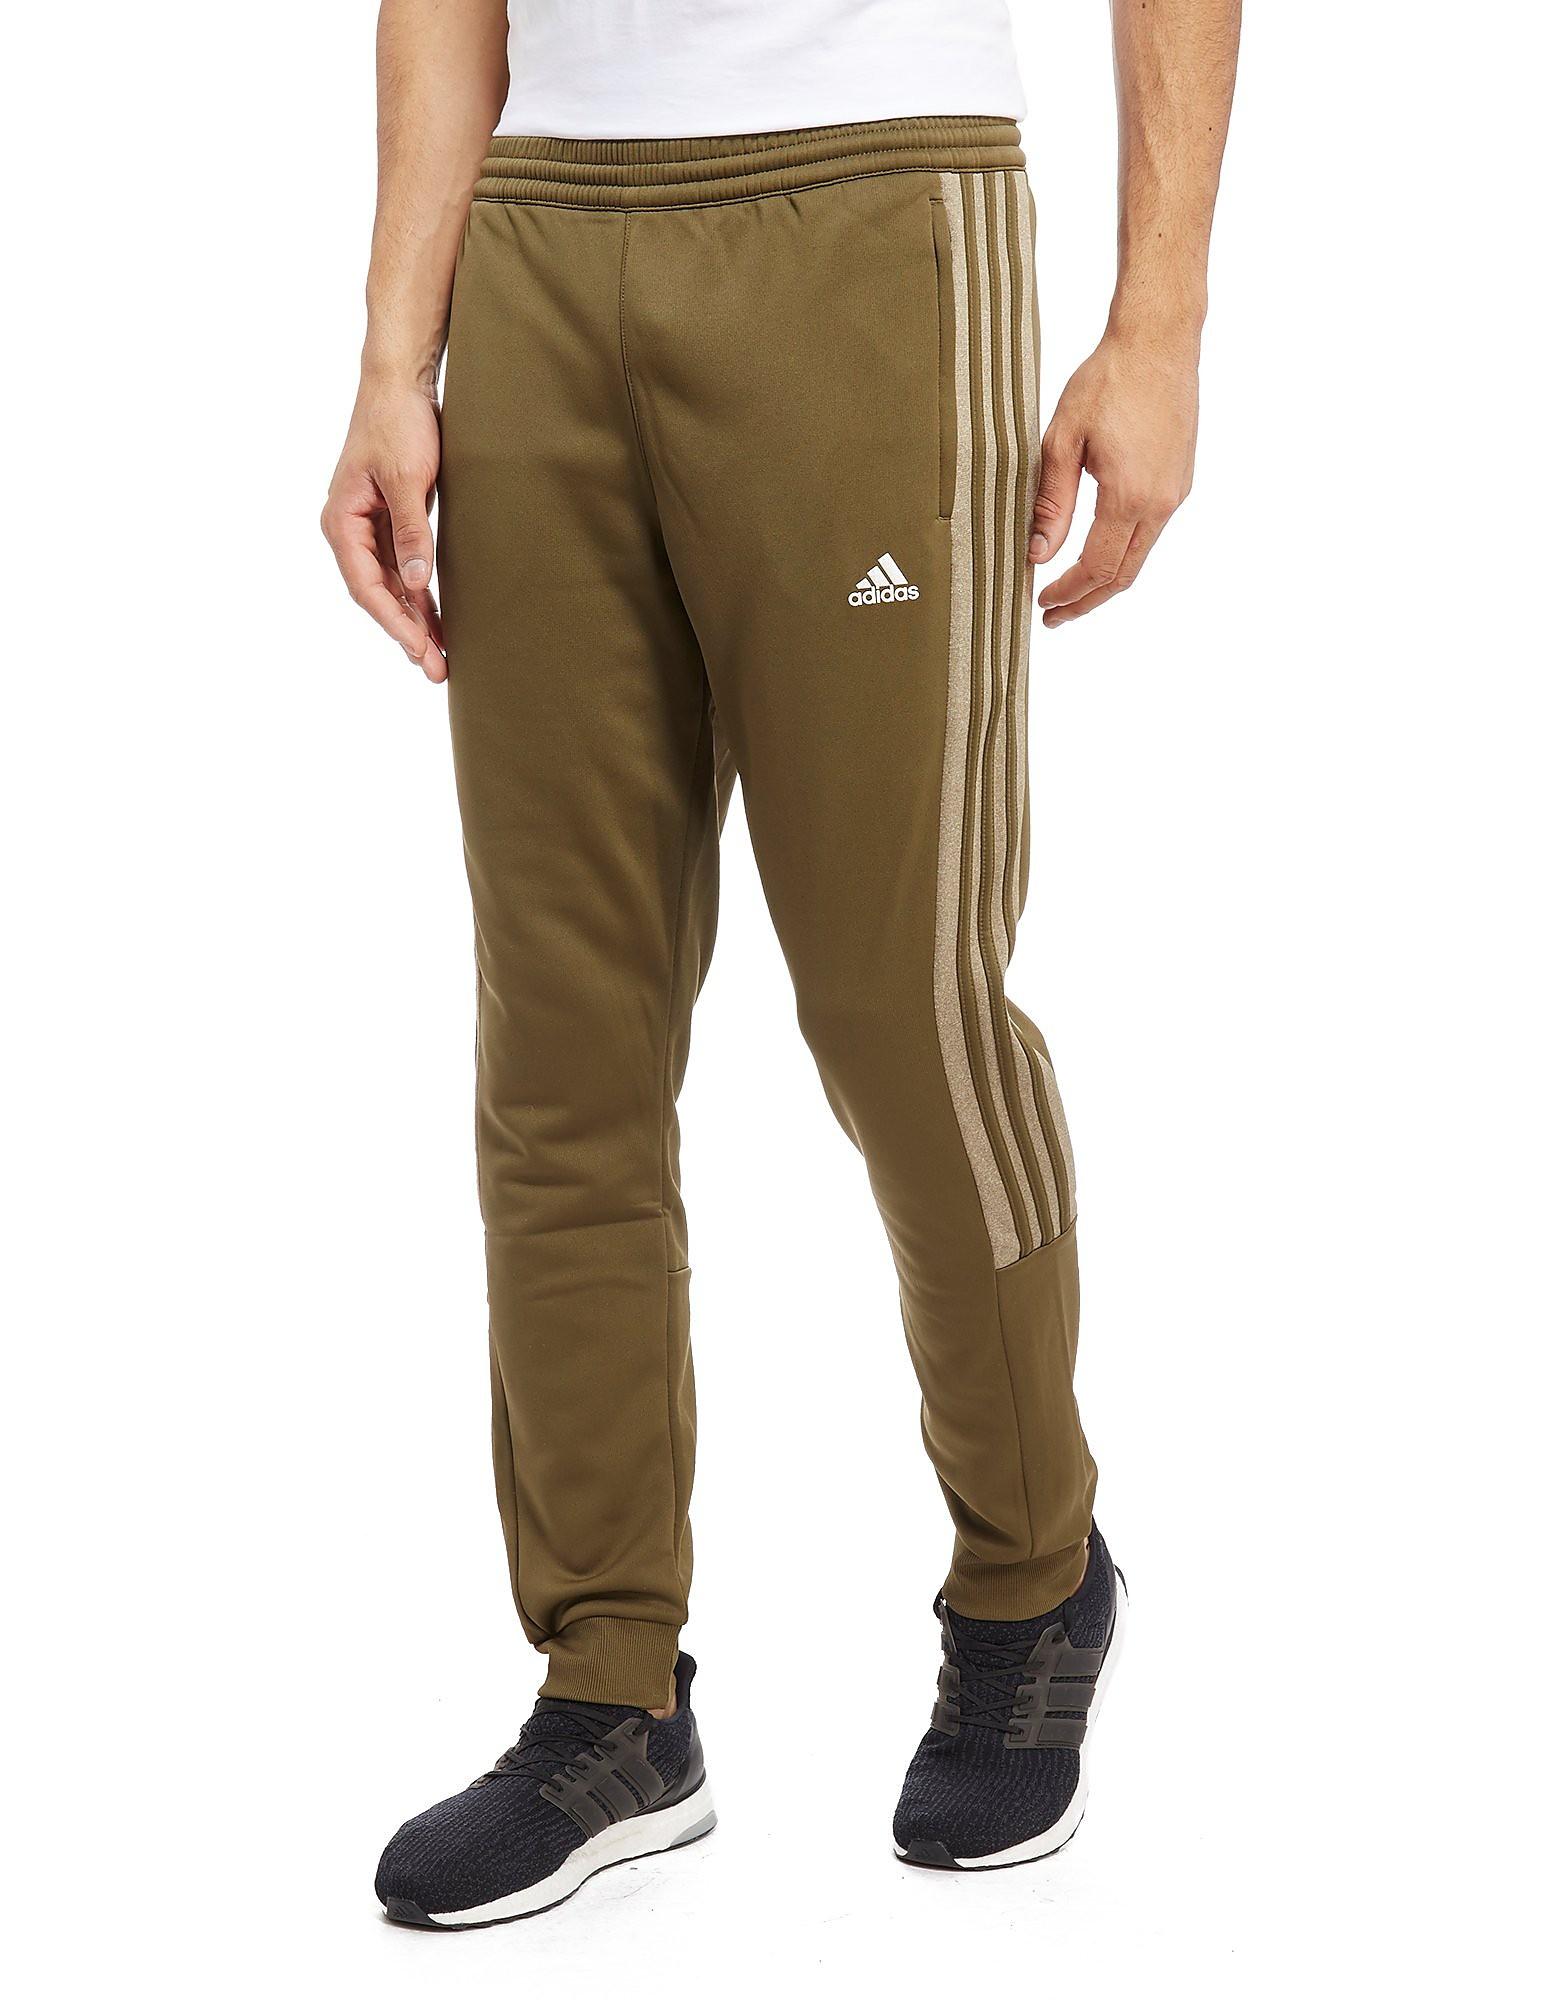 adidas Reflex Pants